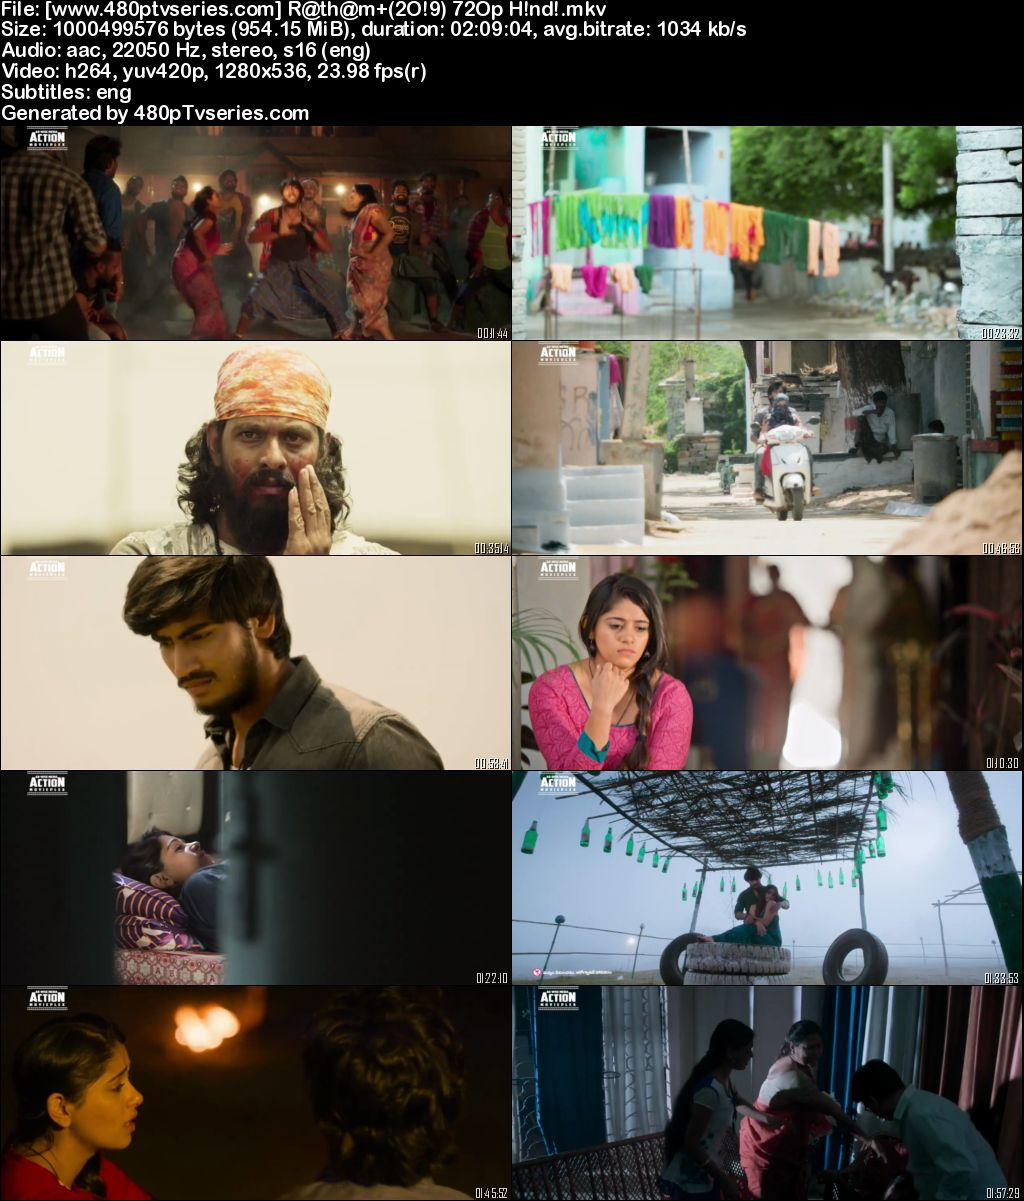 Ratham (2019) Full Hindi Dubbed Movie Download 480p 720p HDRip Free Watch Online Full Movie Download Worldfree4u 9xmovies